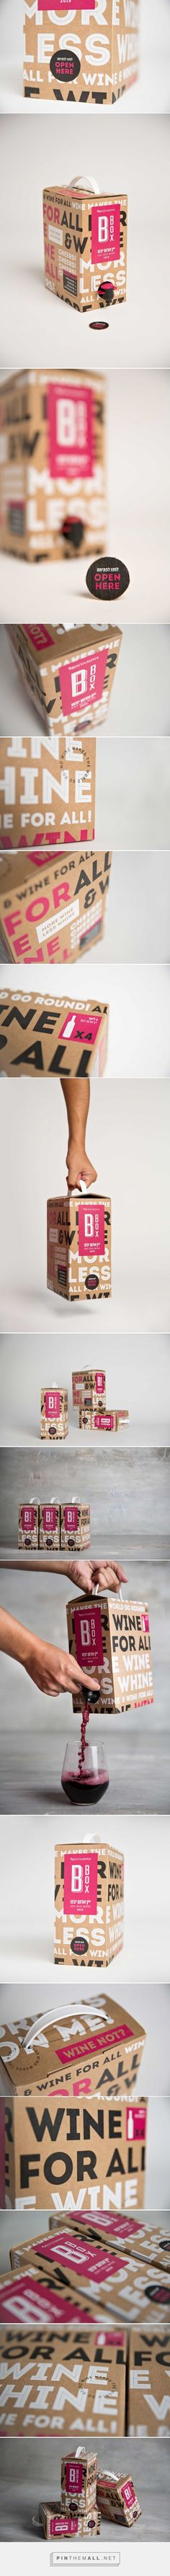 Bbox Box Wine packaging design by Awesome TLV (Israel) - http://www.packagingoftheworld.com/2016/08/bbox.html